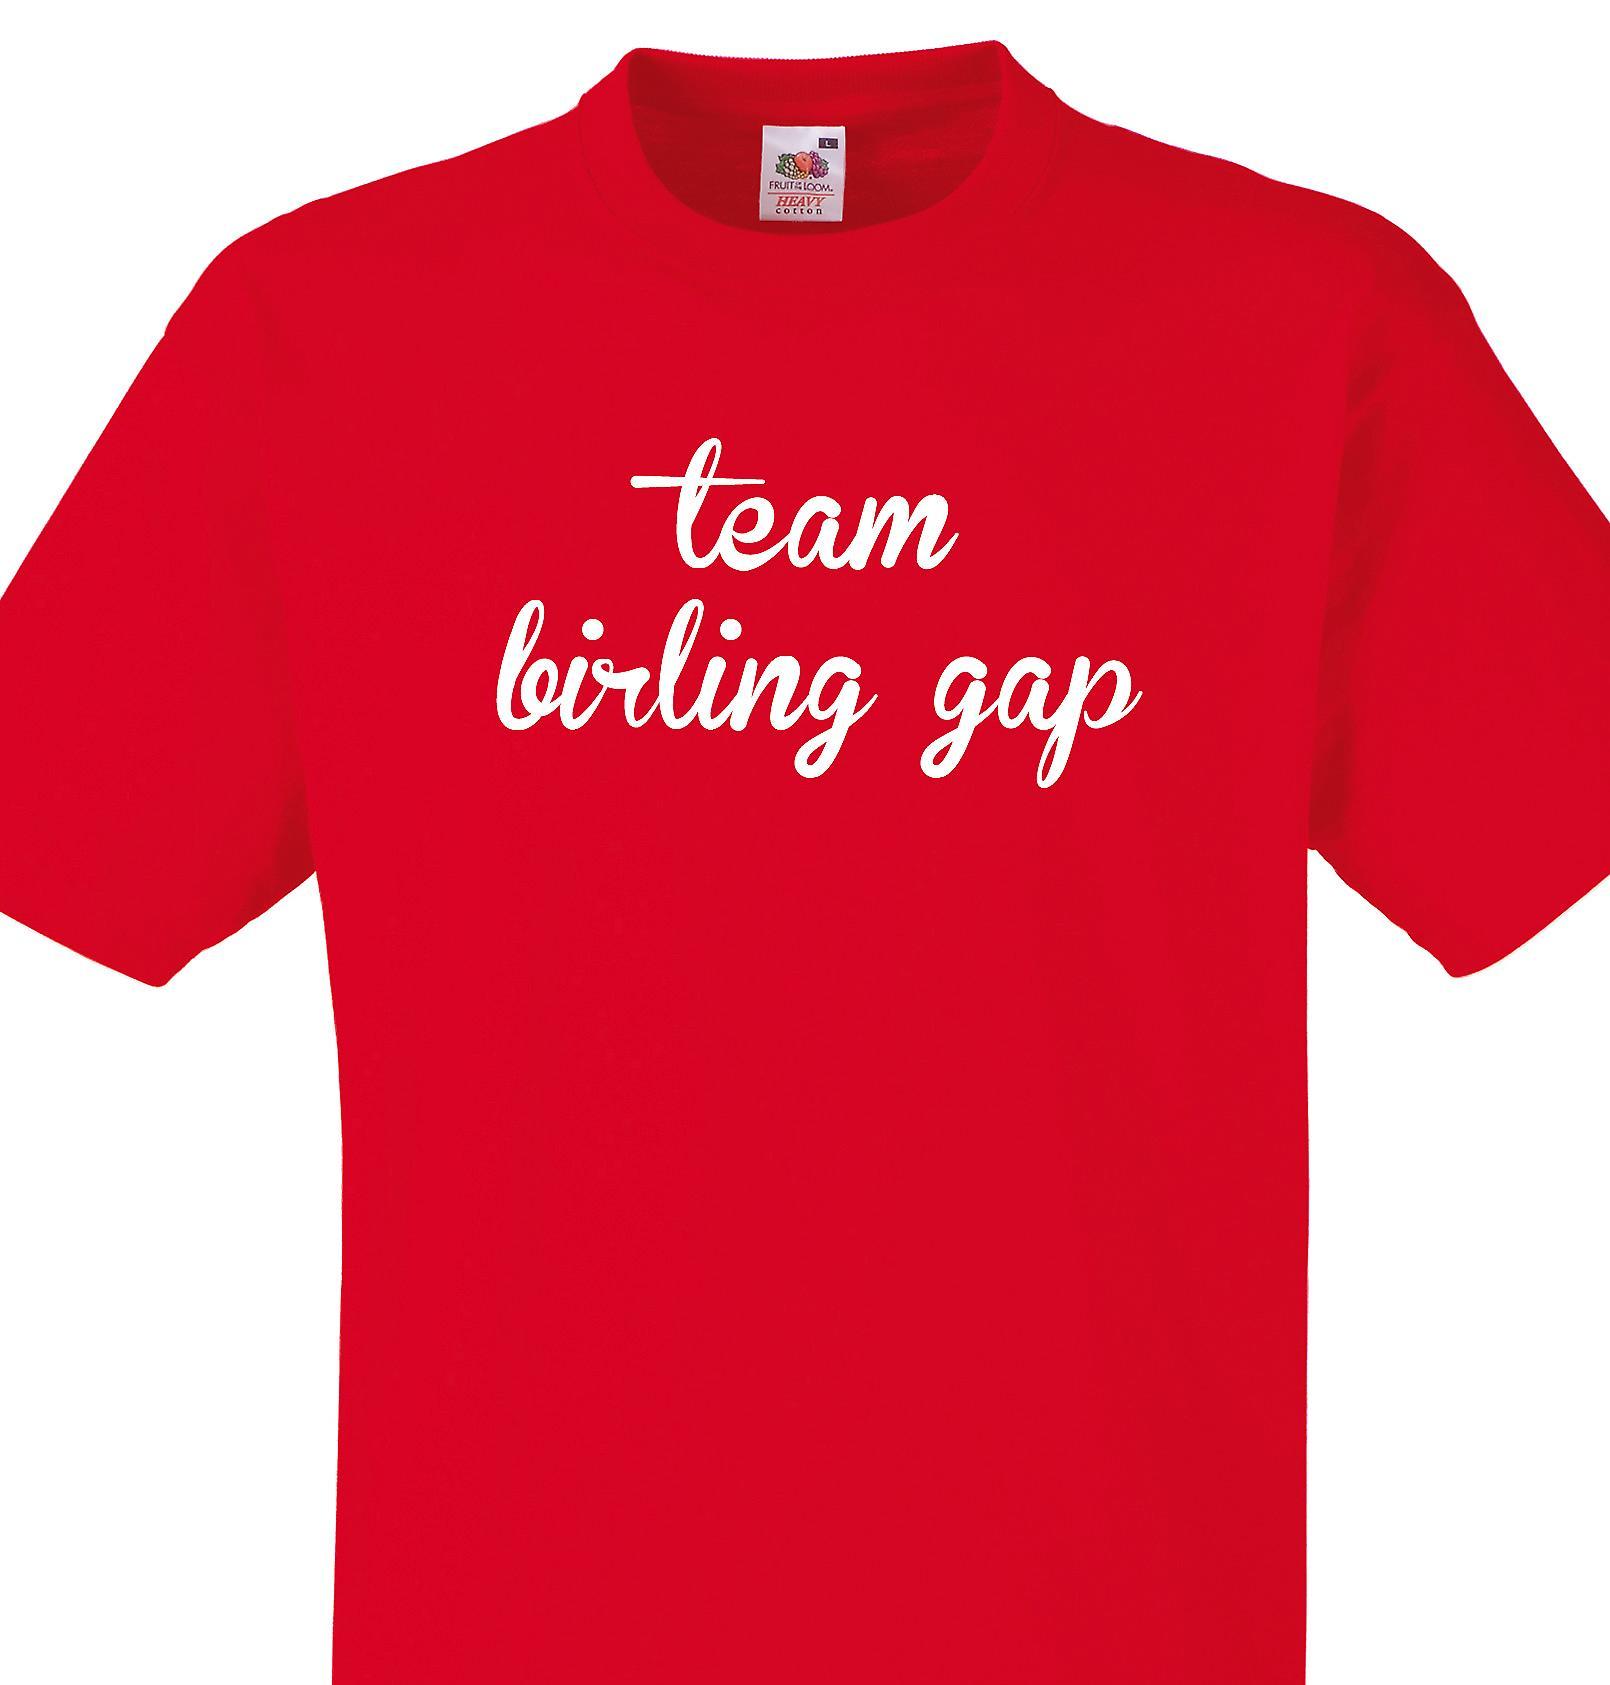 Team Birling gap Red T shirt